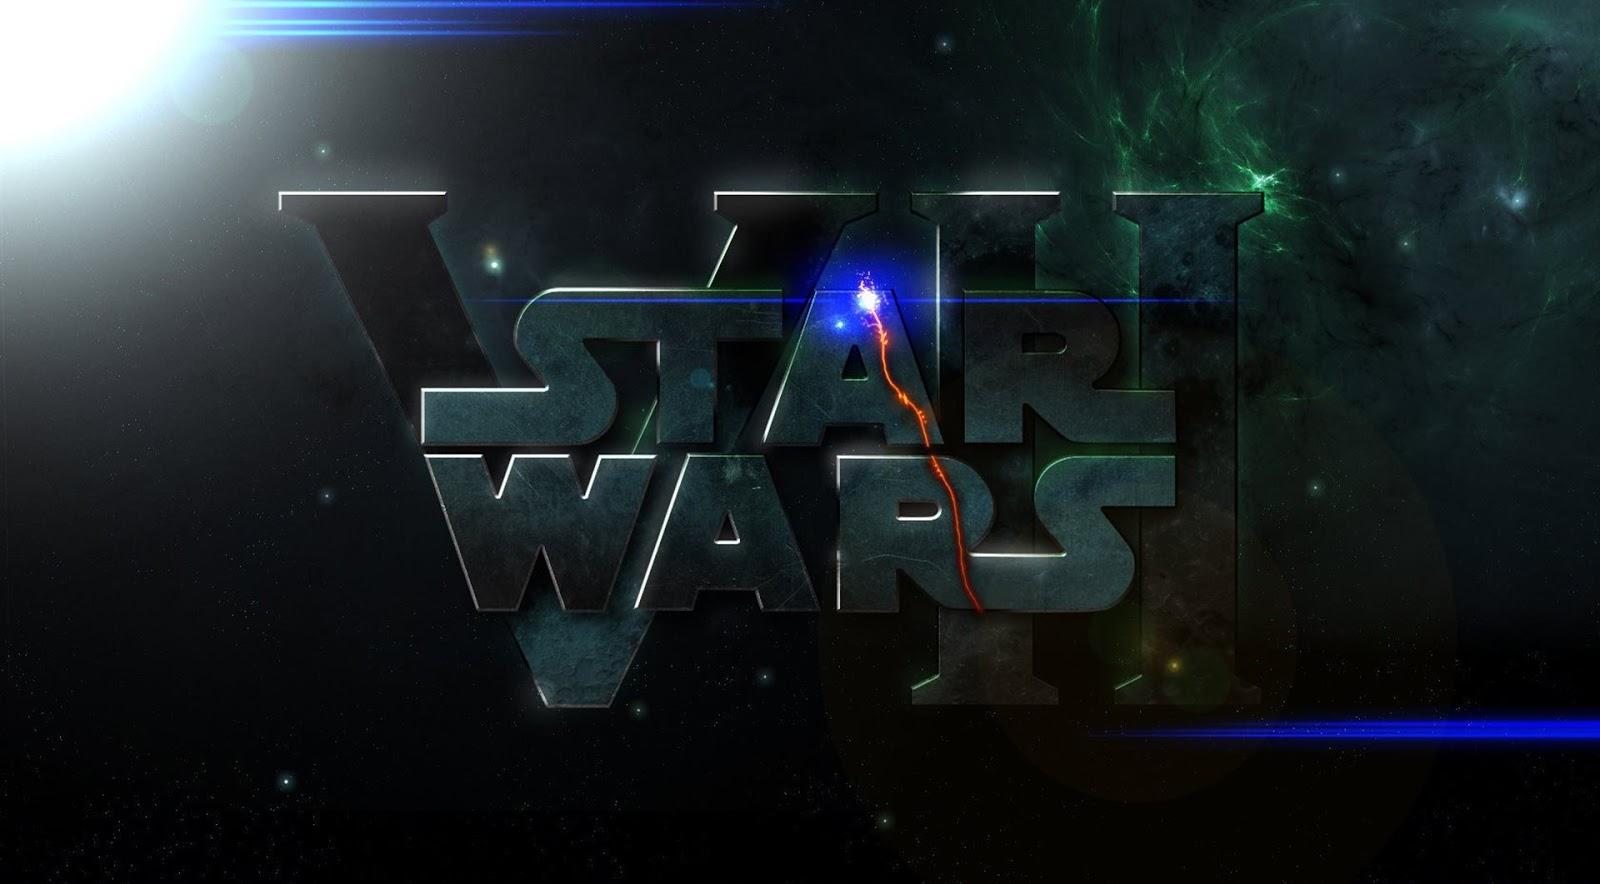 Star Wars Poster HD Wallpaper